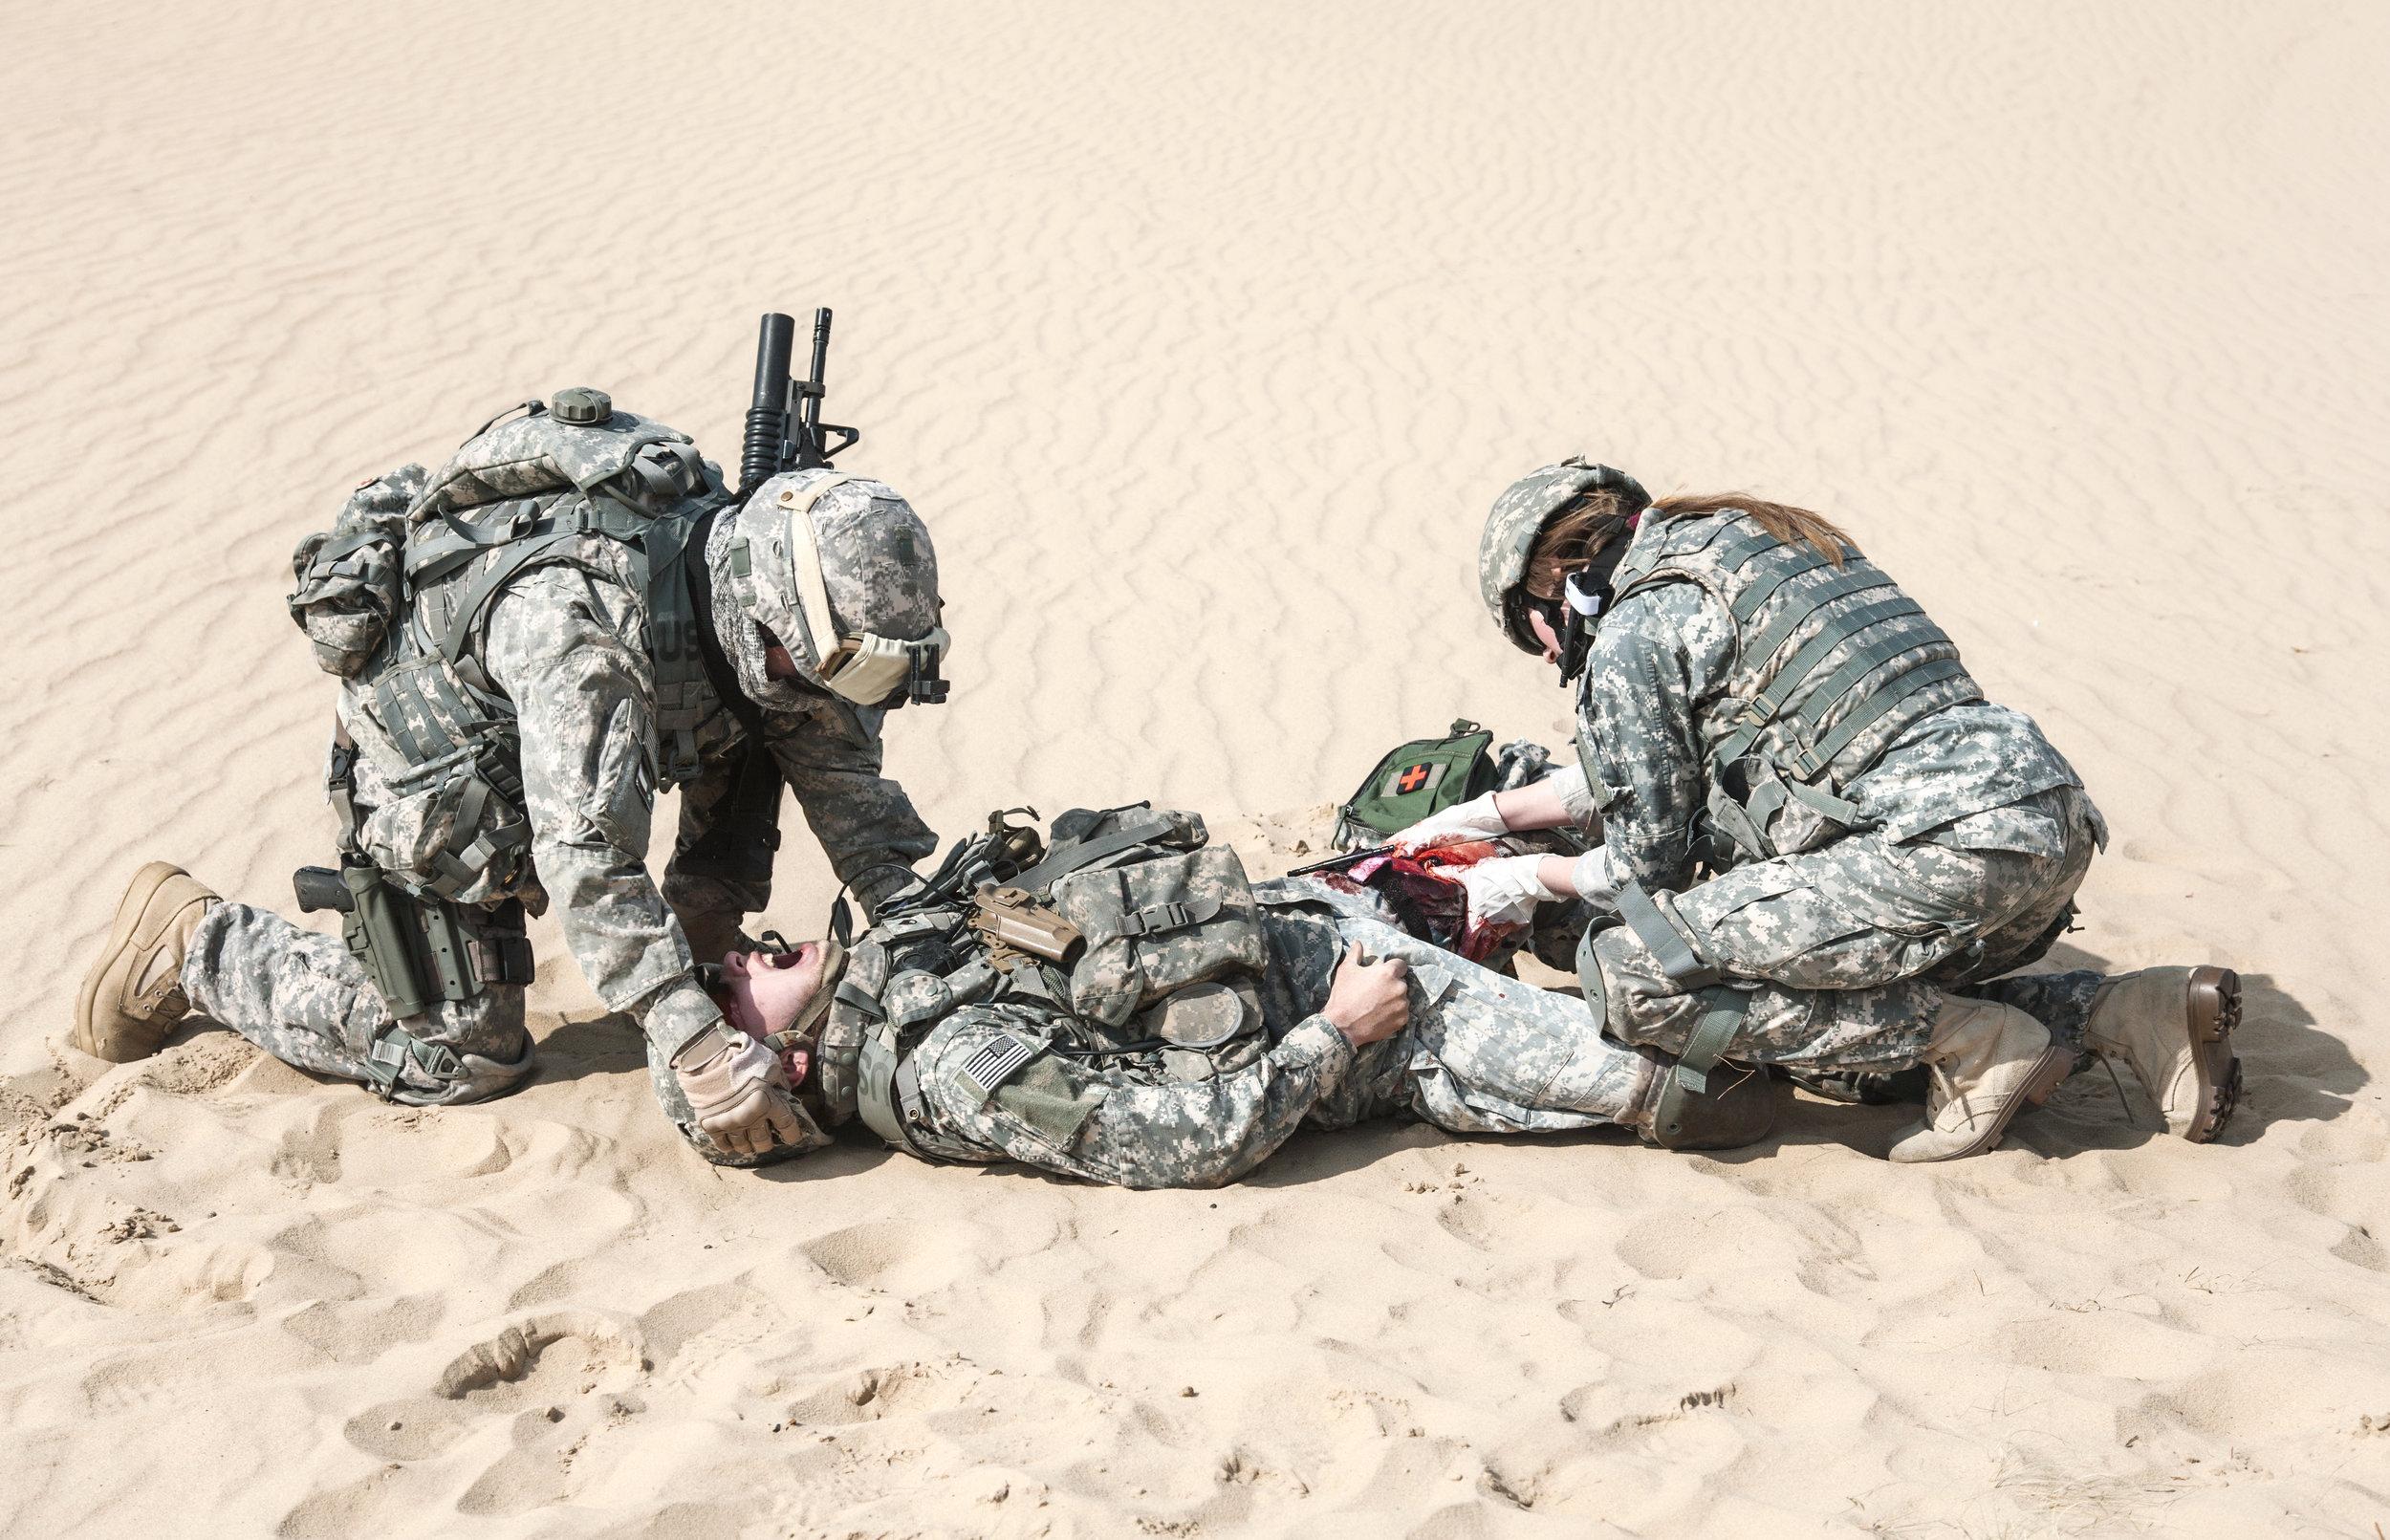 photodune-20917172-united-states-paratrooper-airborne-xl.jpg